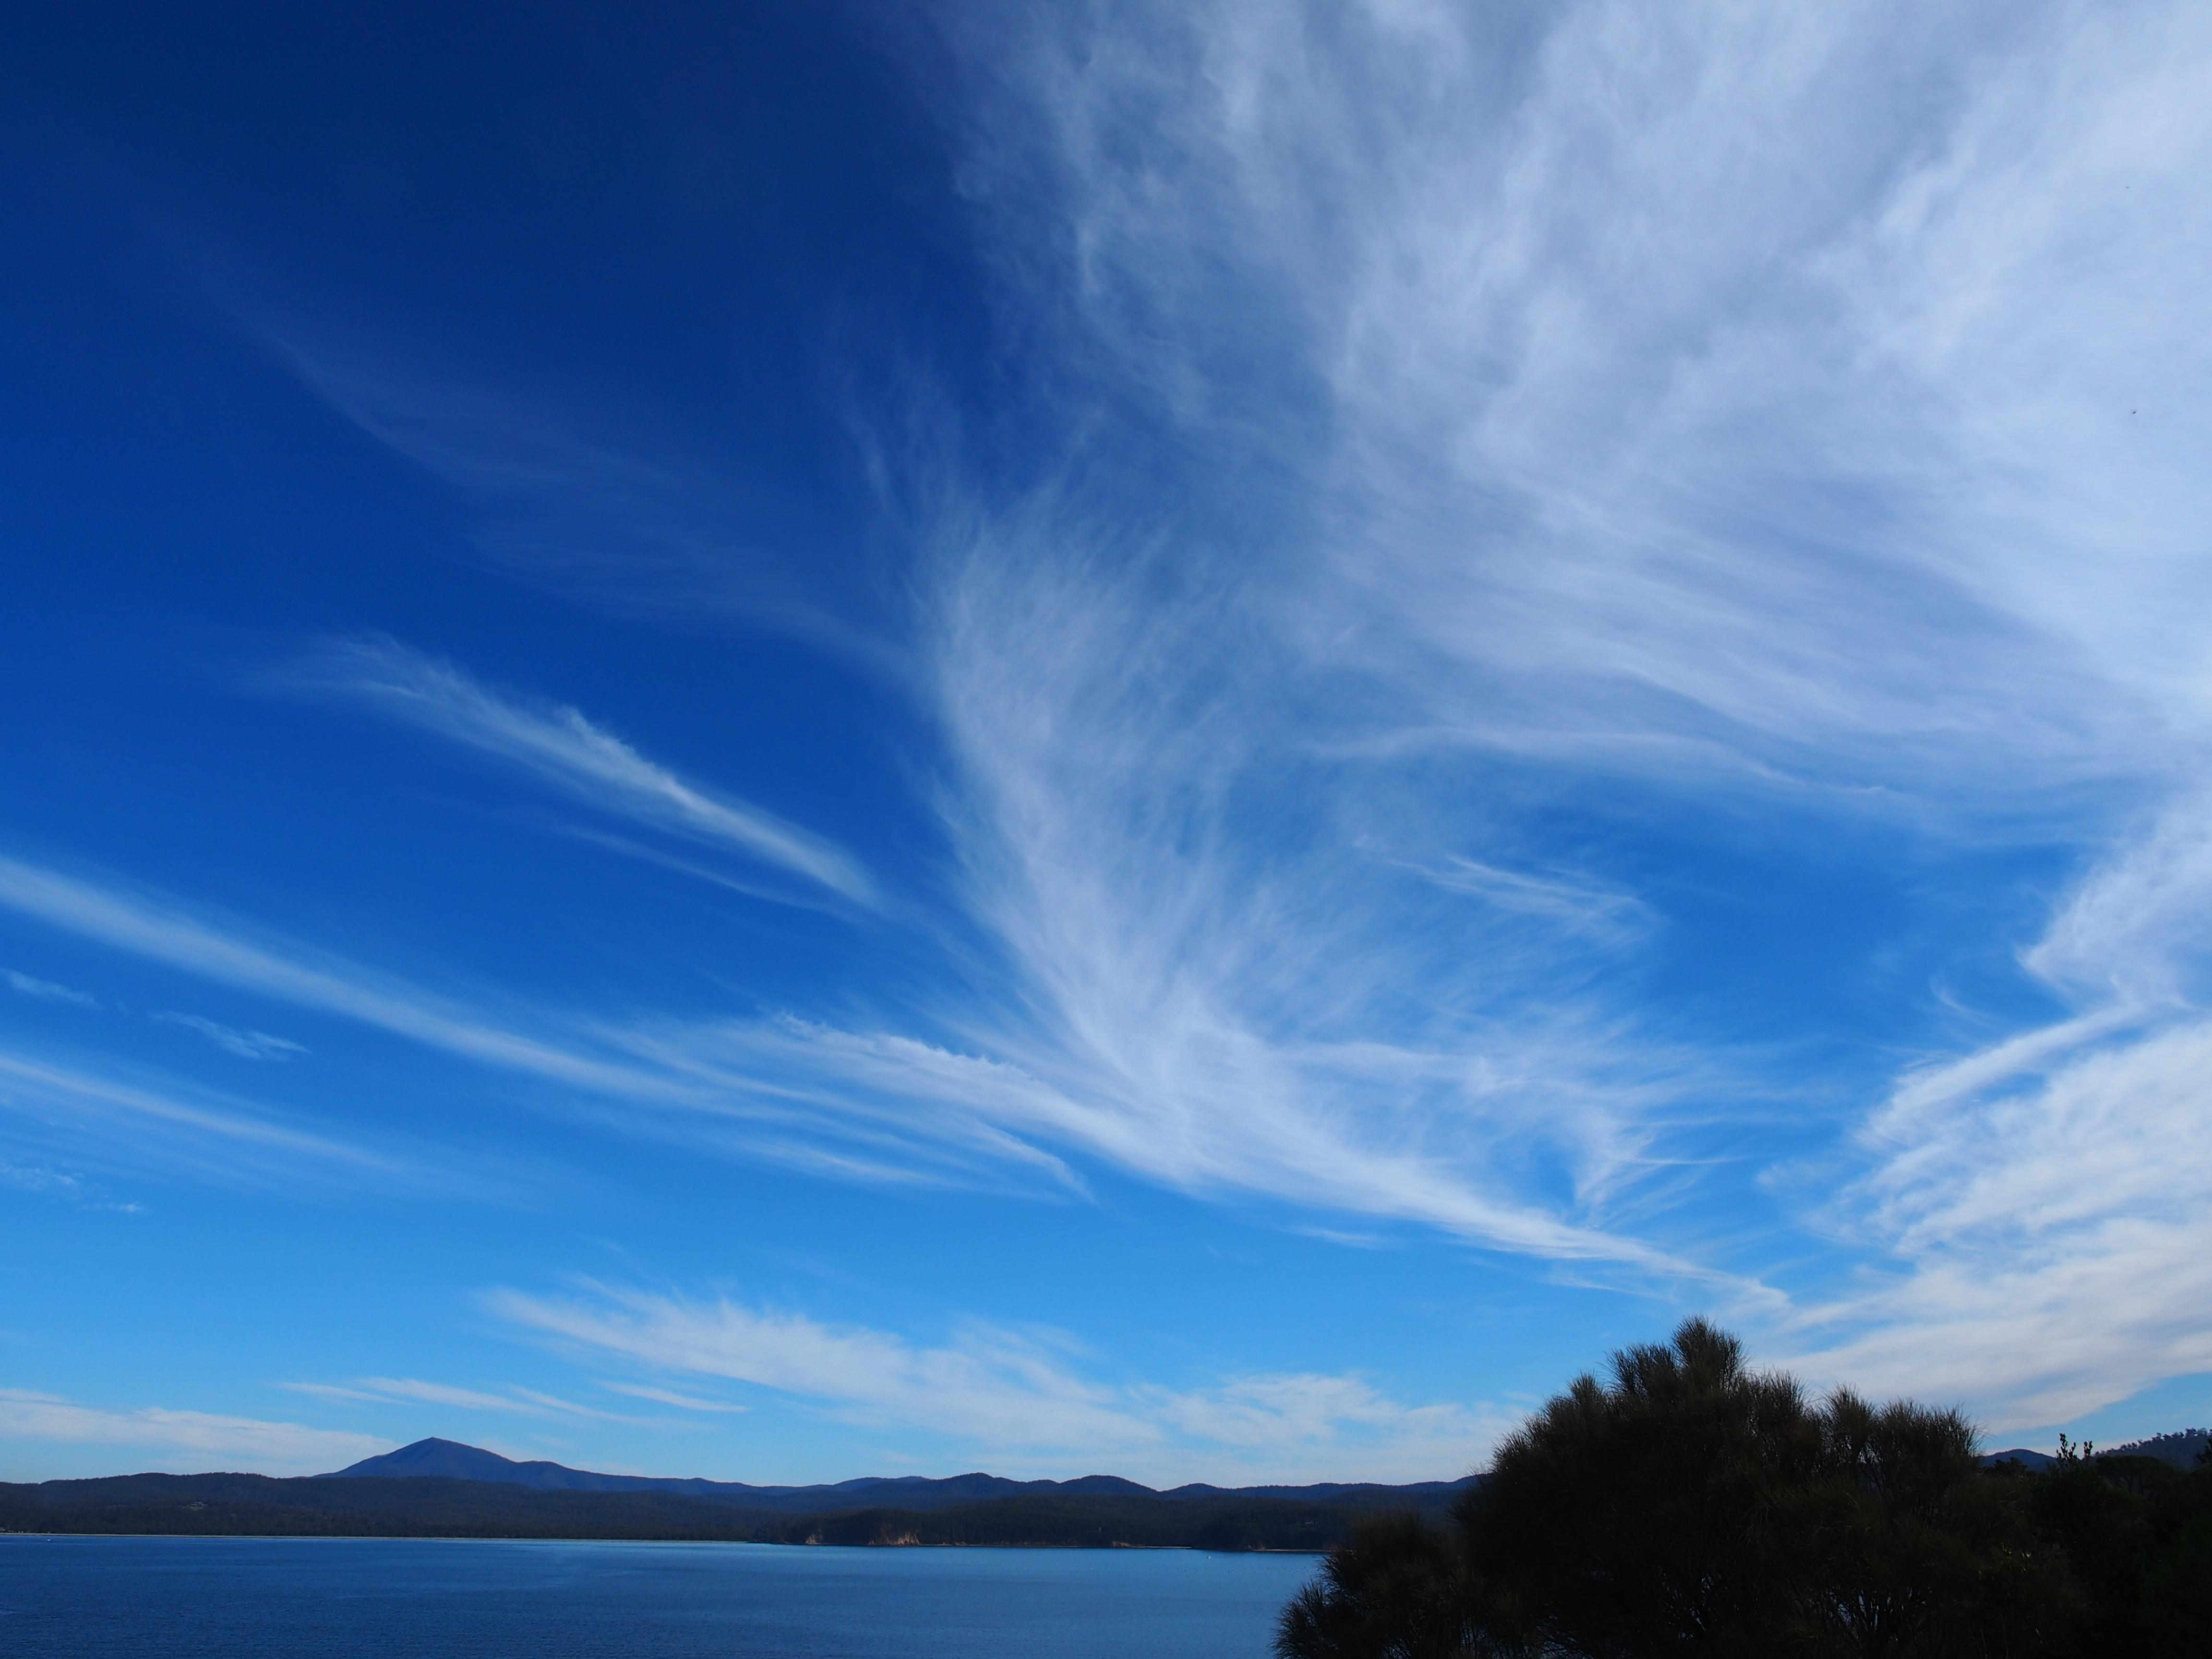 whispy eden clouds nsw australia